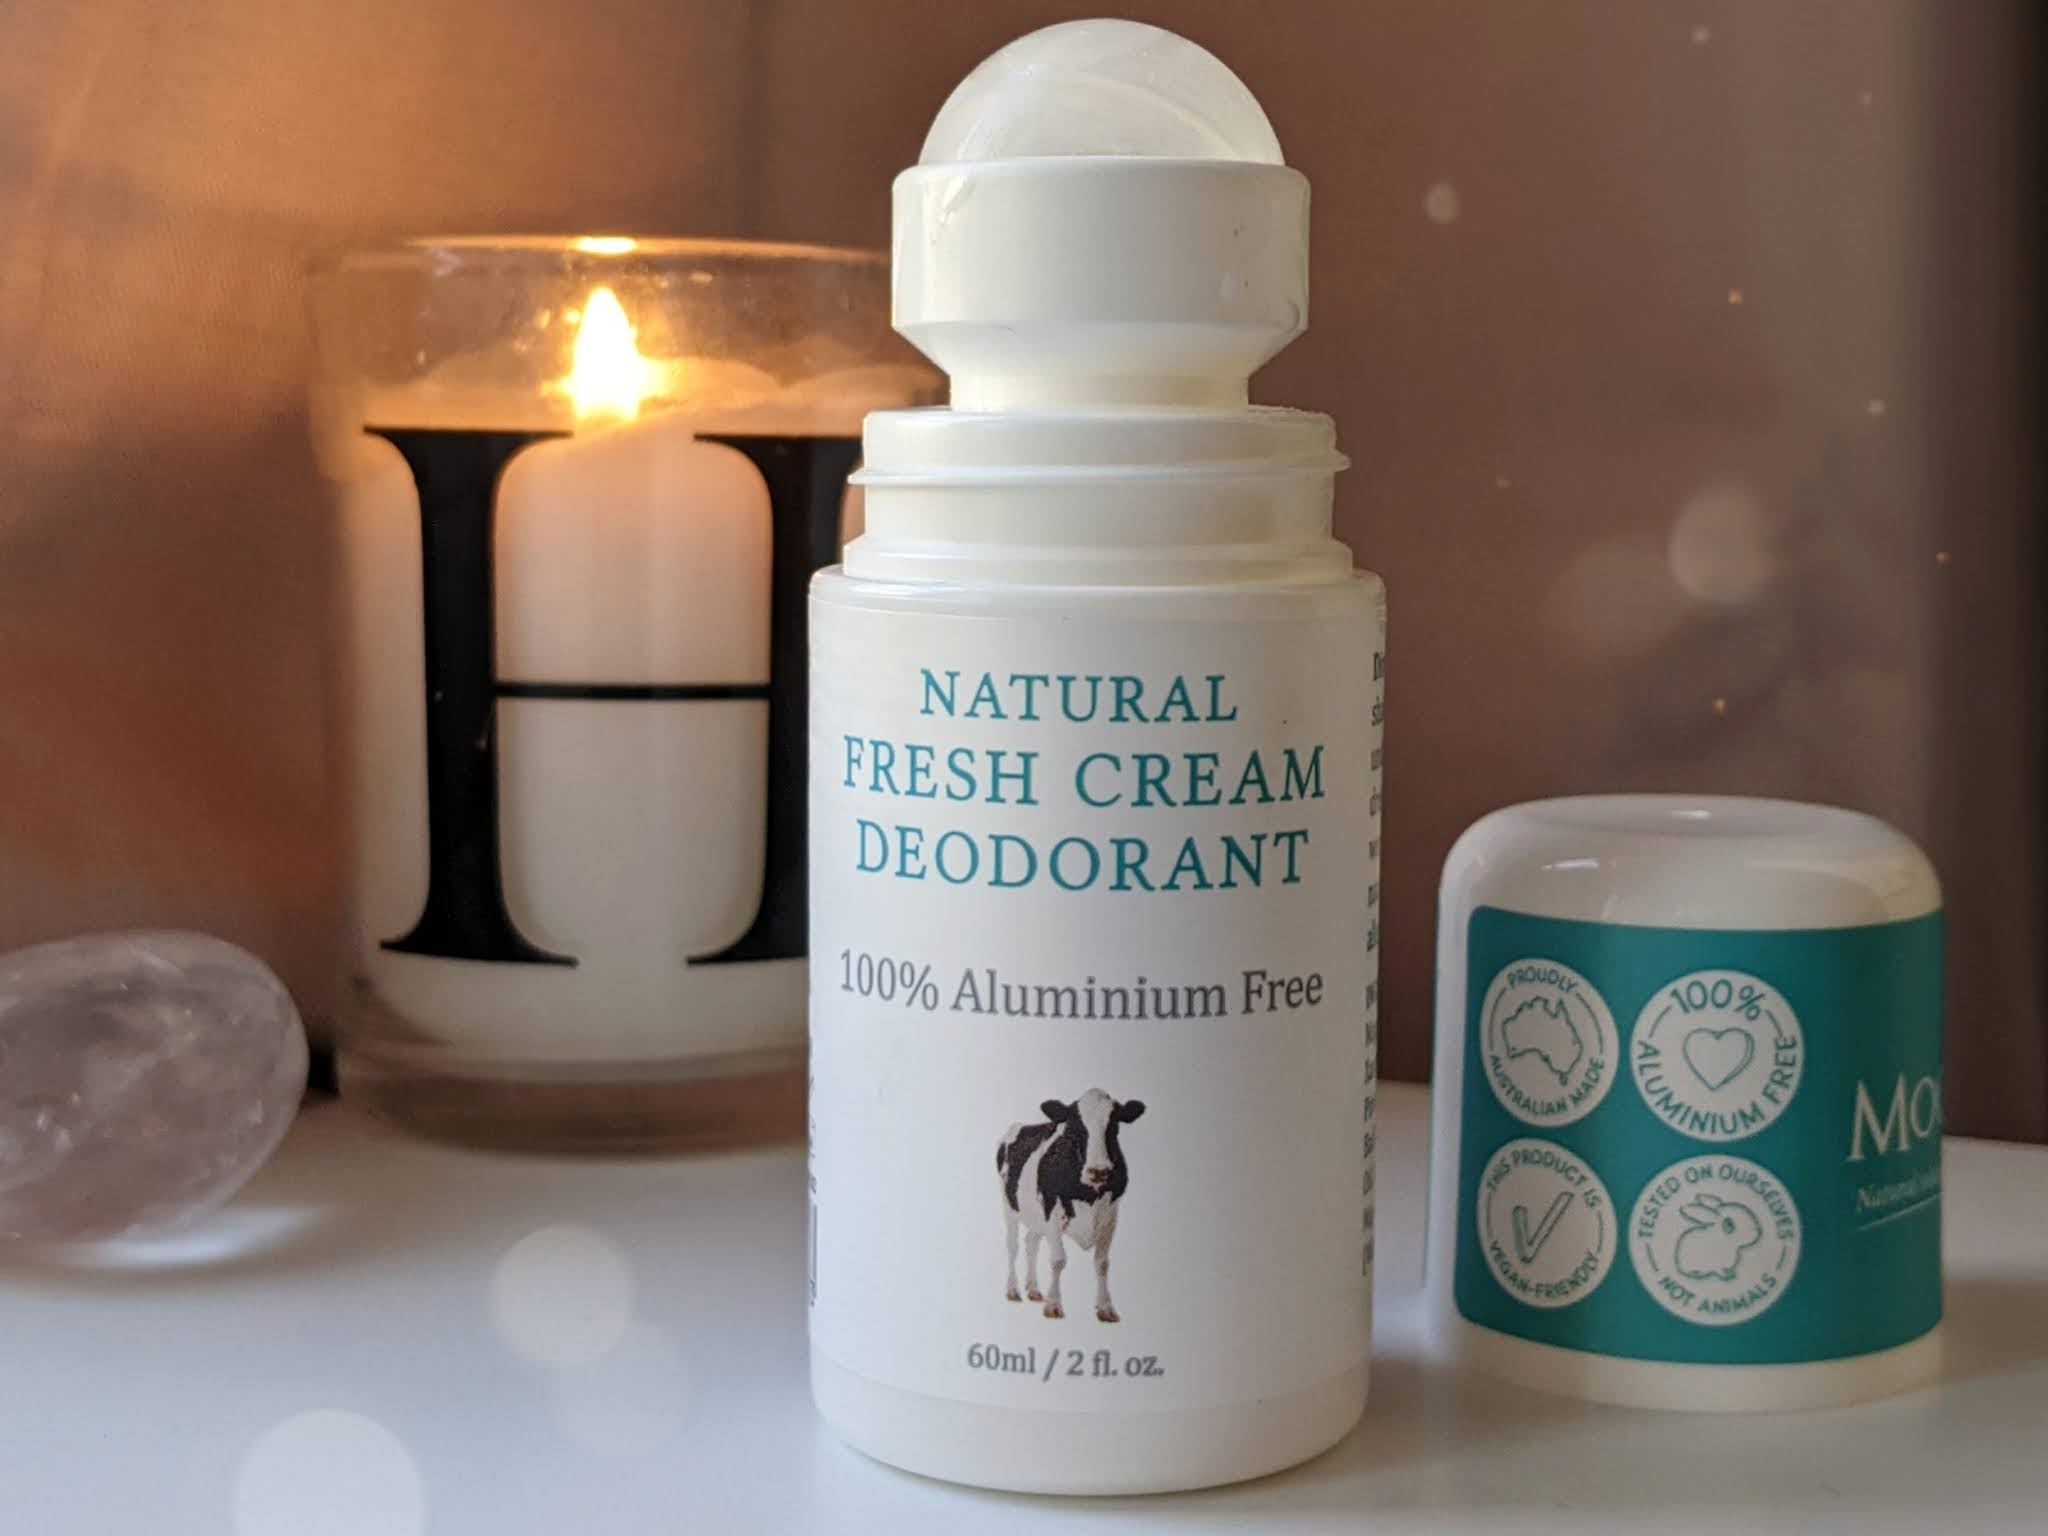 MooGoo Natural Fresh Cream Deodorant littlepackofvegans